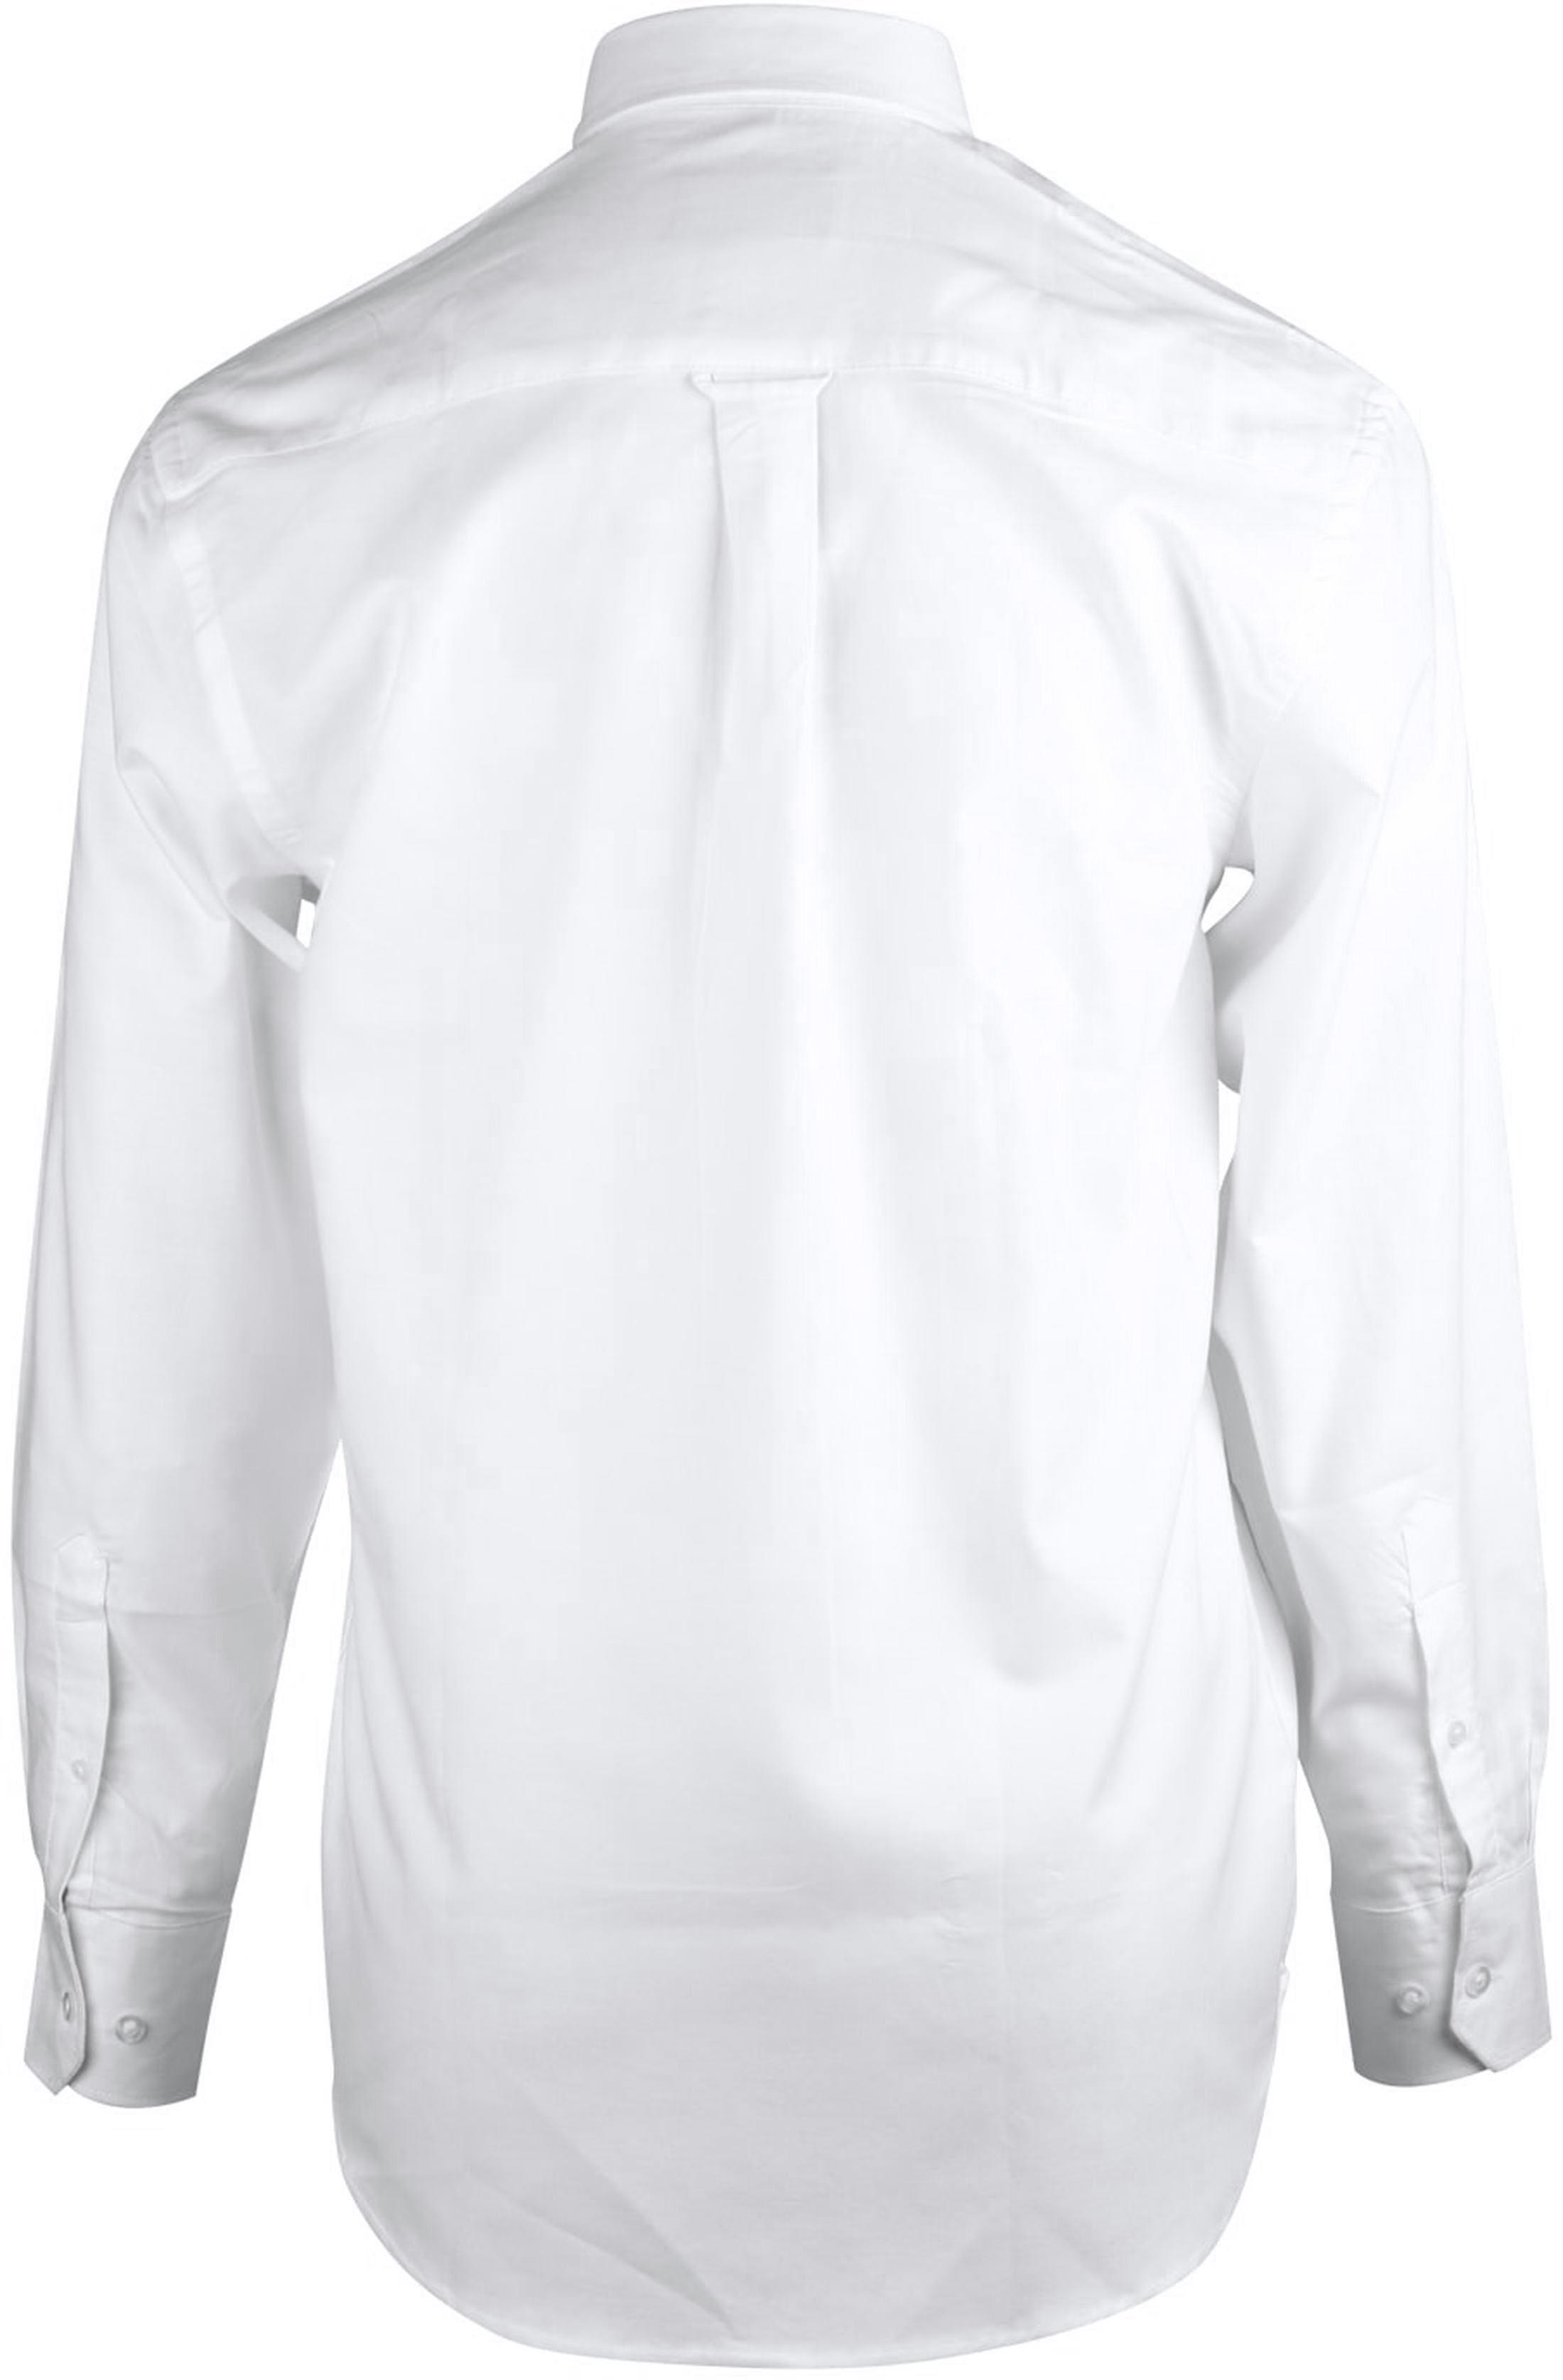 Weiß Casual HemdOxford